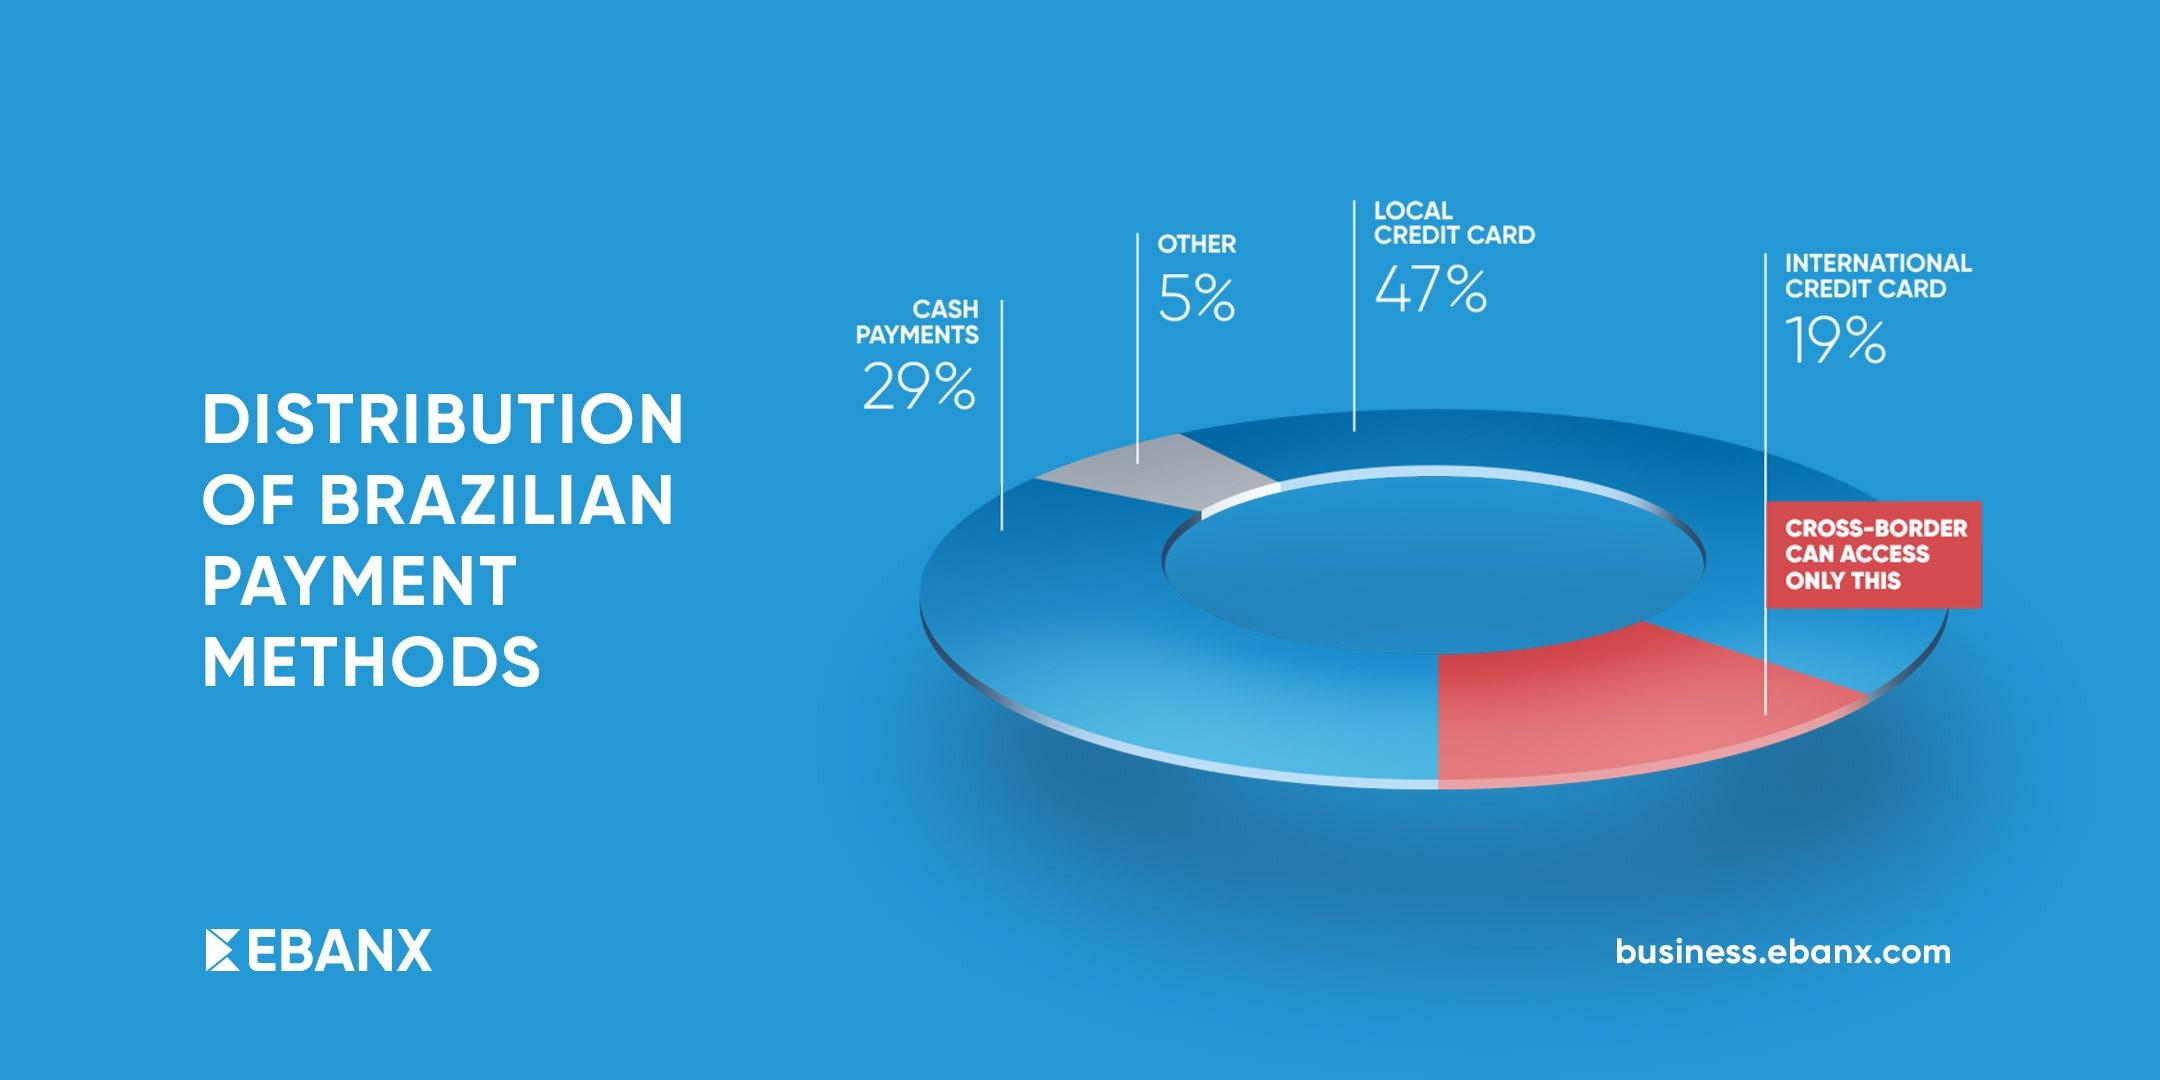 Distribution_of_Payment_Methods_in_Brazil.jpg